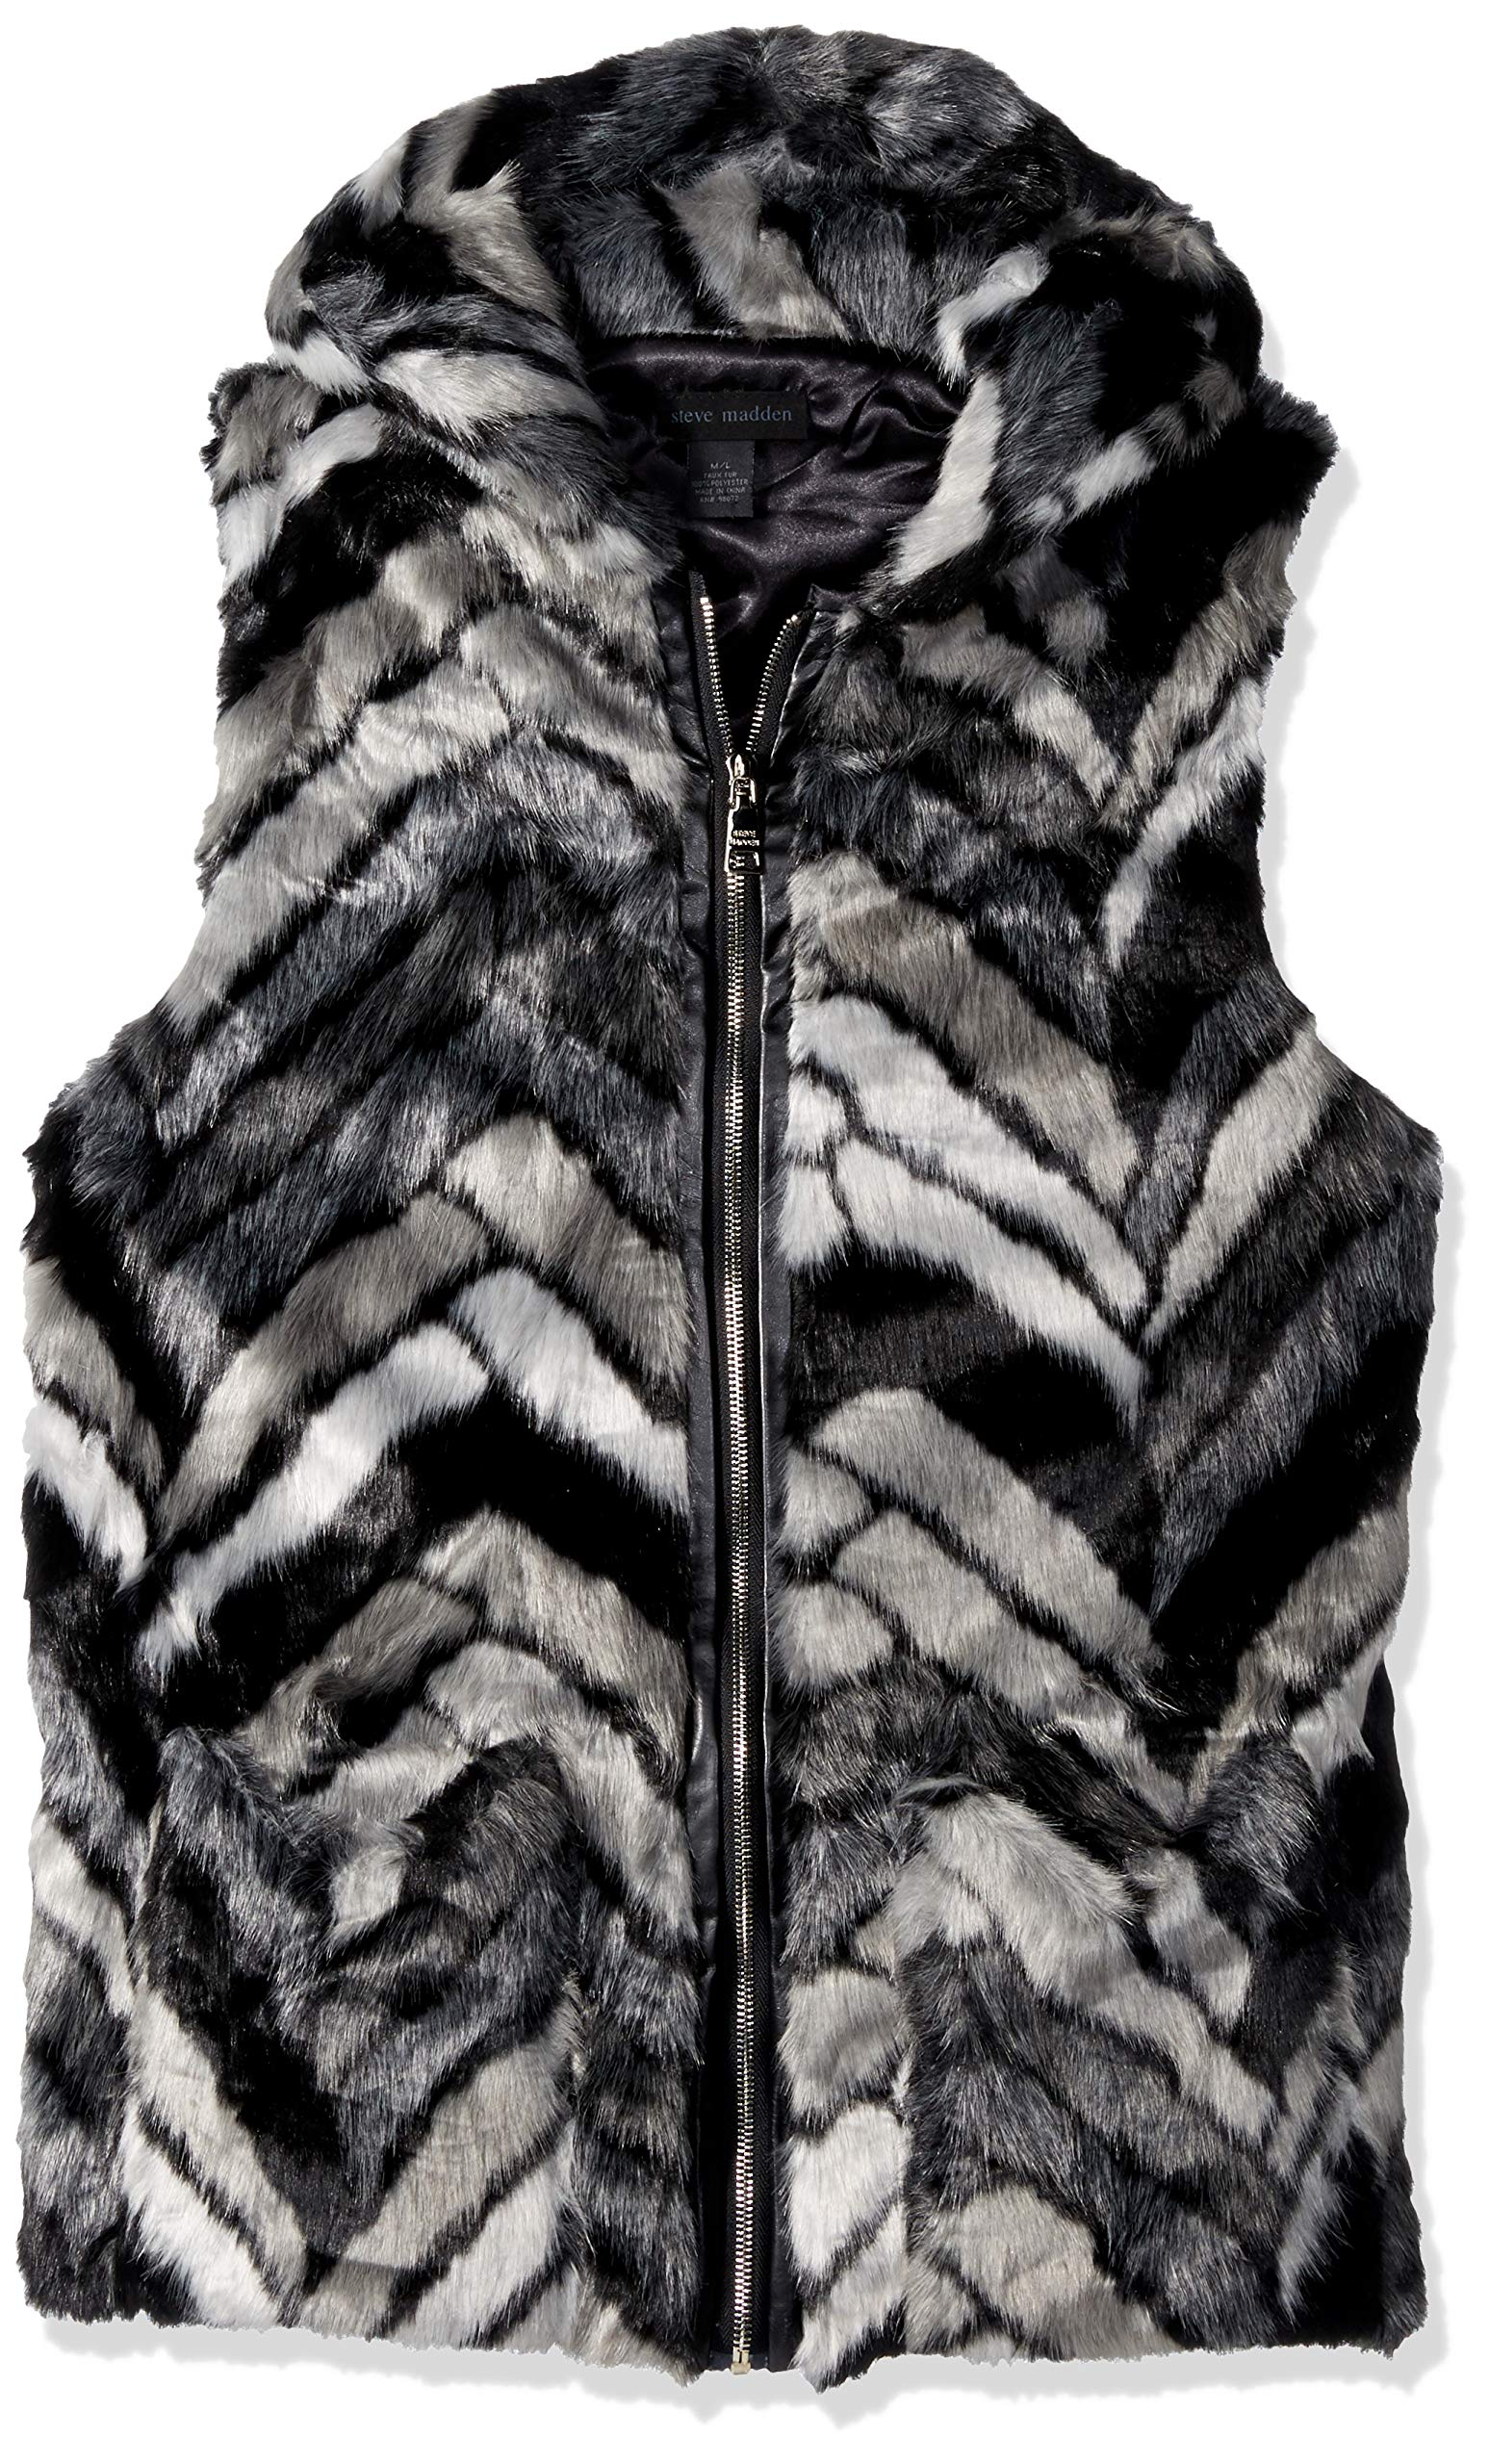 Steve Madden Women's Chevron Faux Fur Zip Hood Vest, black/grey M/L